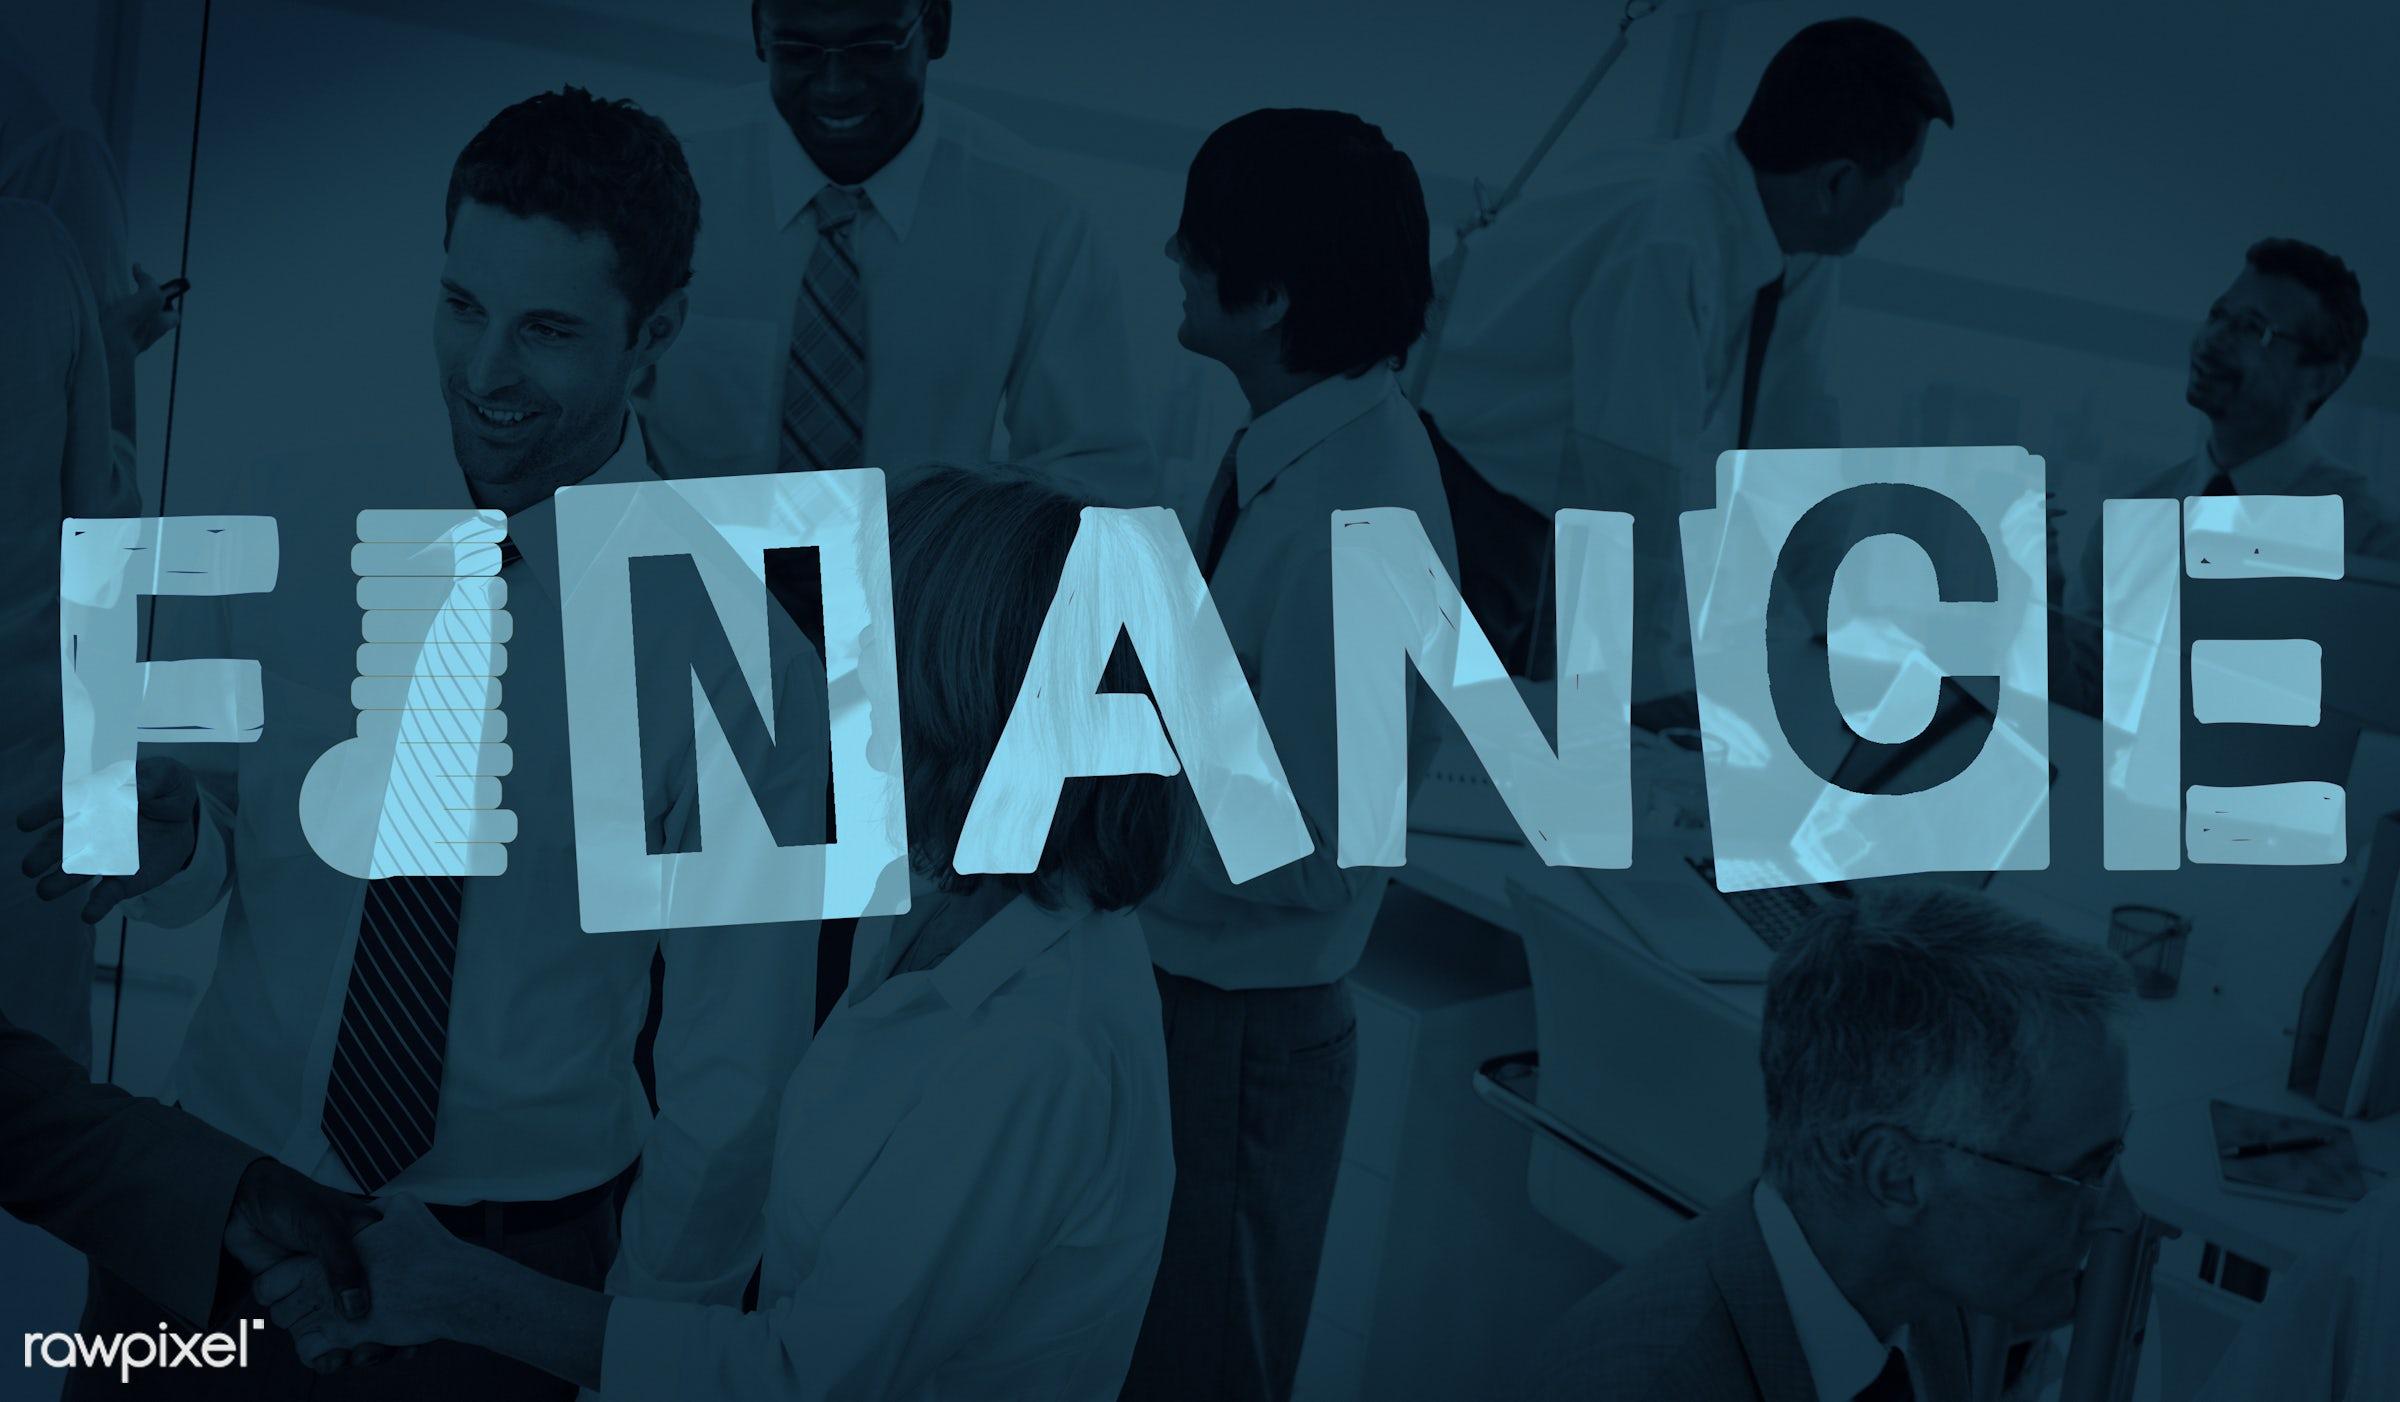 accounting, african descent, analysis, asian ethnicity, asset, audit, banking, budget, business, businessmen, businesswomen...